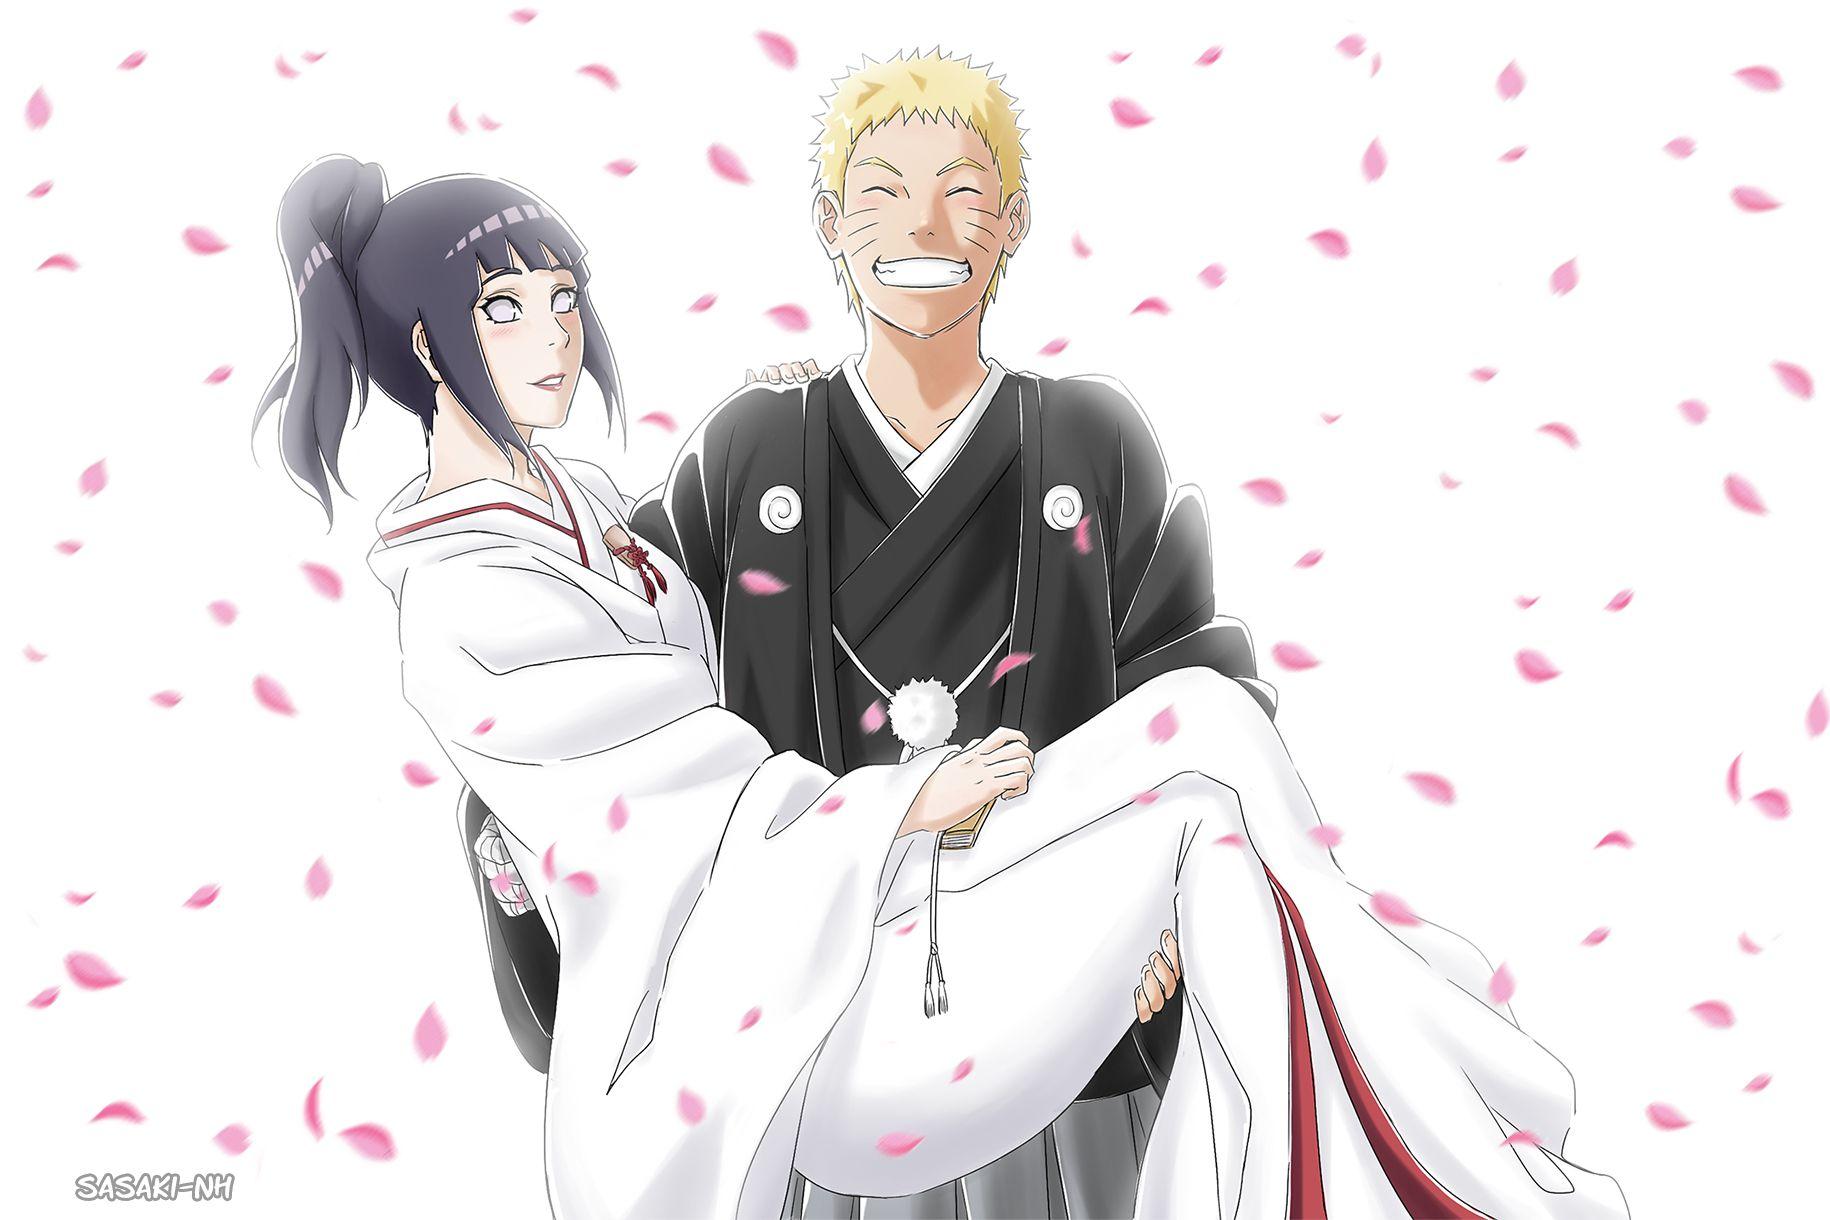 Naruto Full 2083078 Jpg 1830 1220 Naruto Anime Naruto Naruto Images